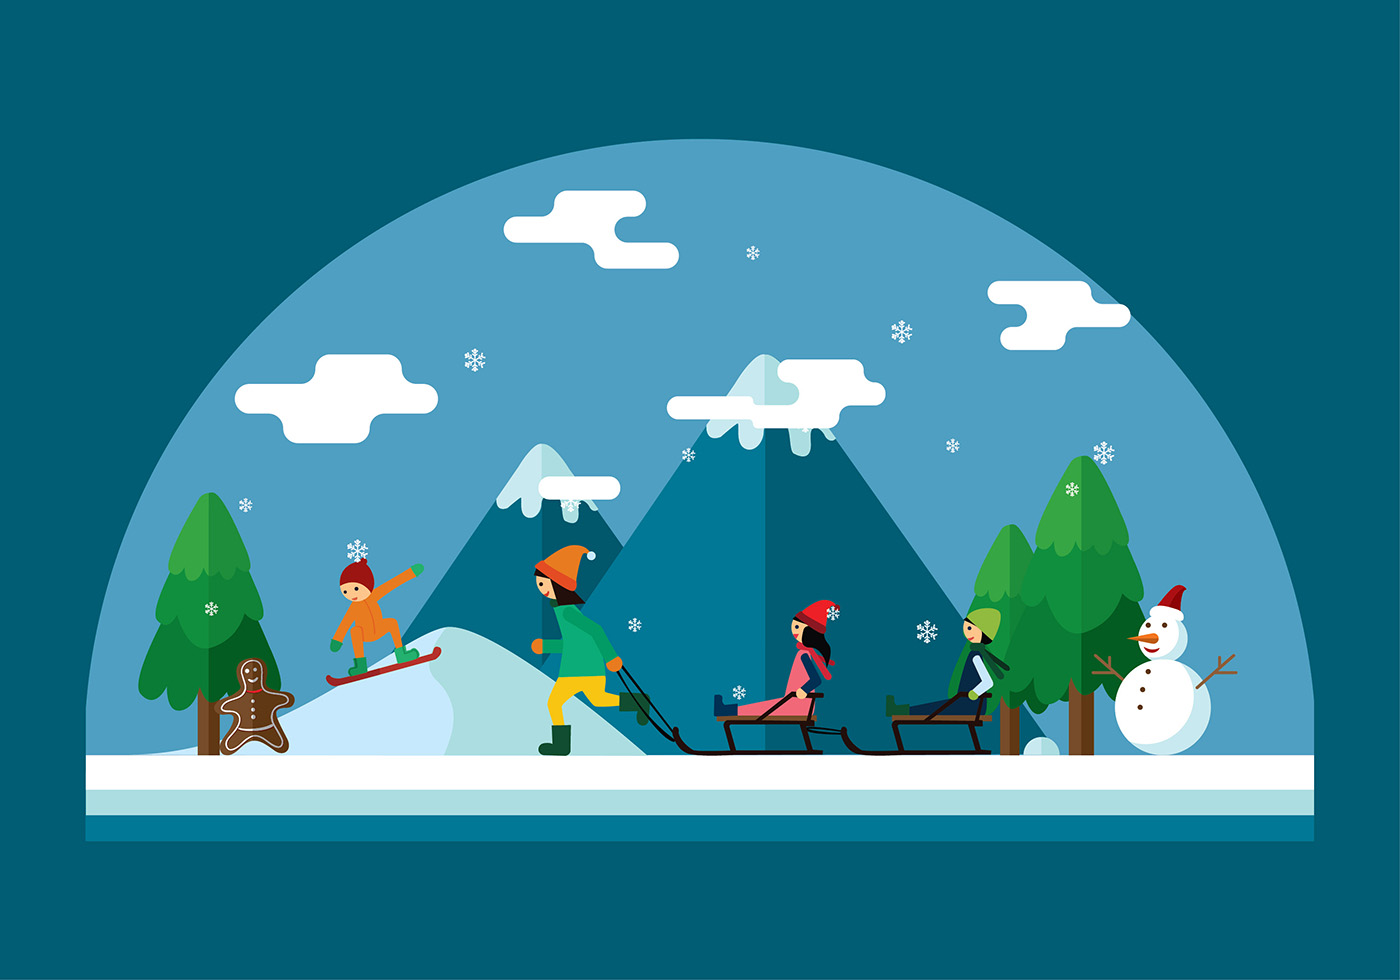 winter scene free vector art 9618 free downloads. Black Bedroom Furniture Sets. Home Design Ideas